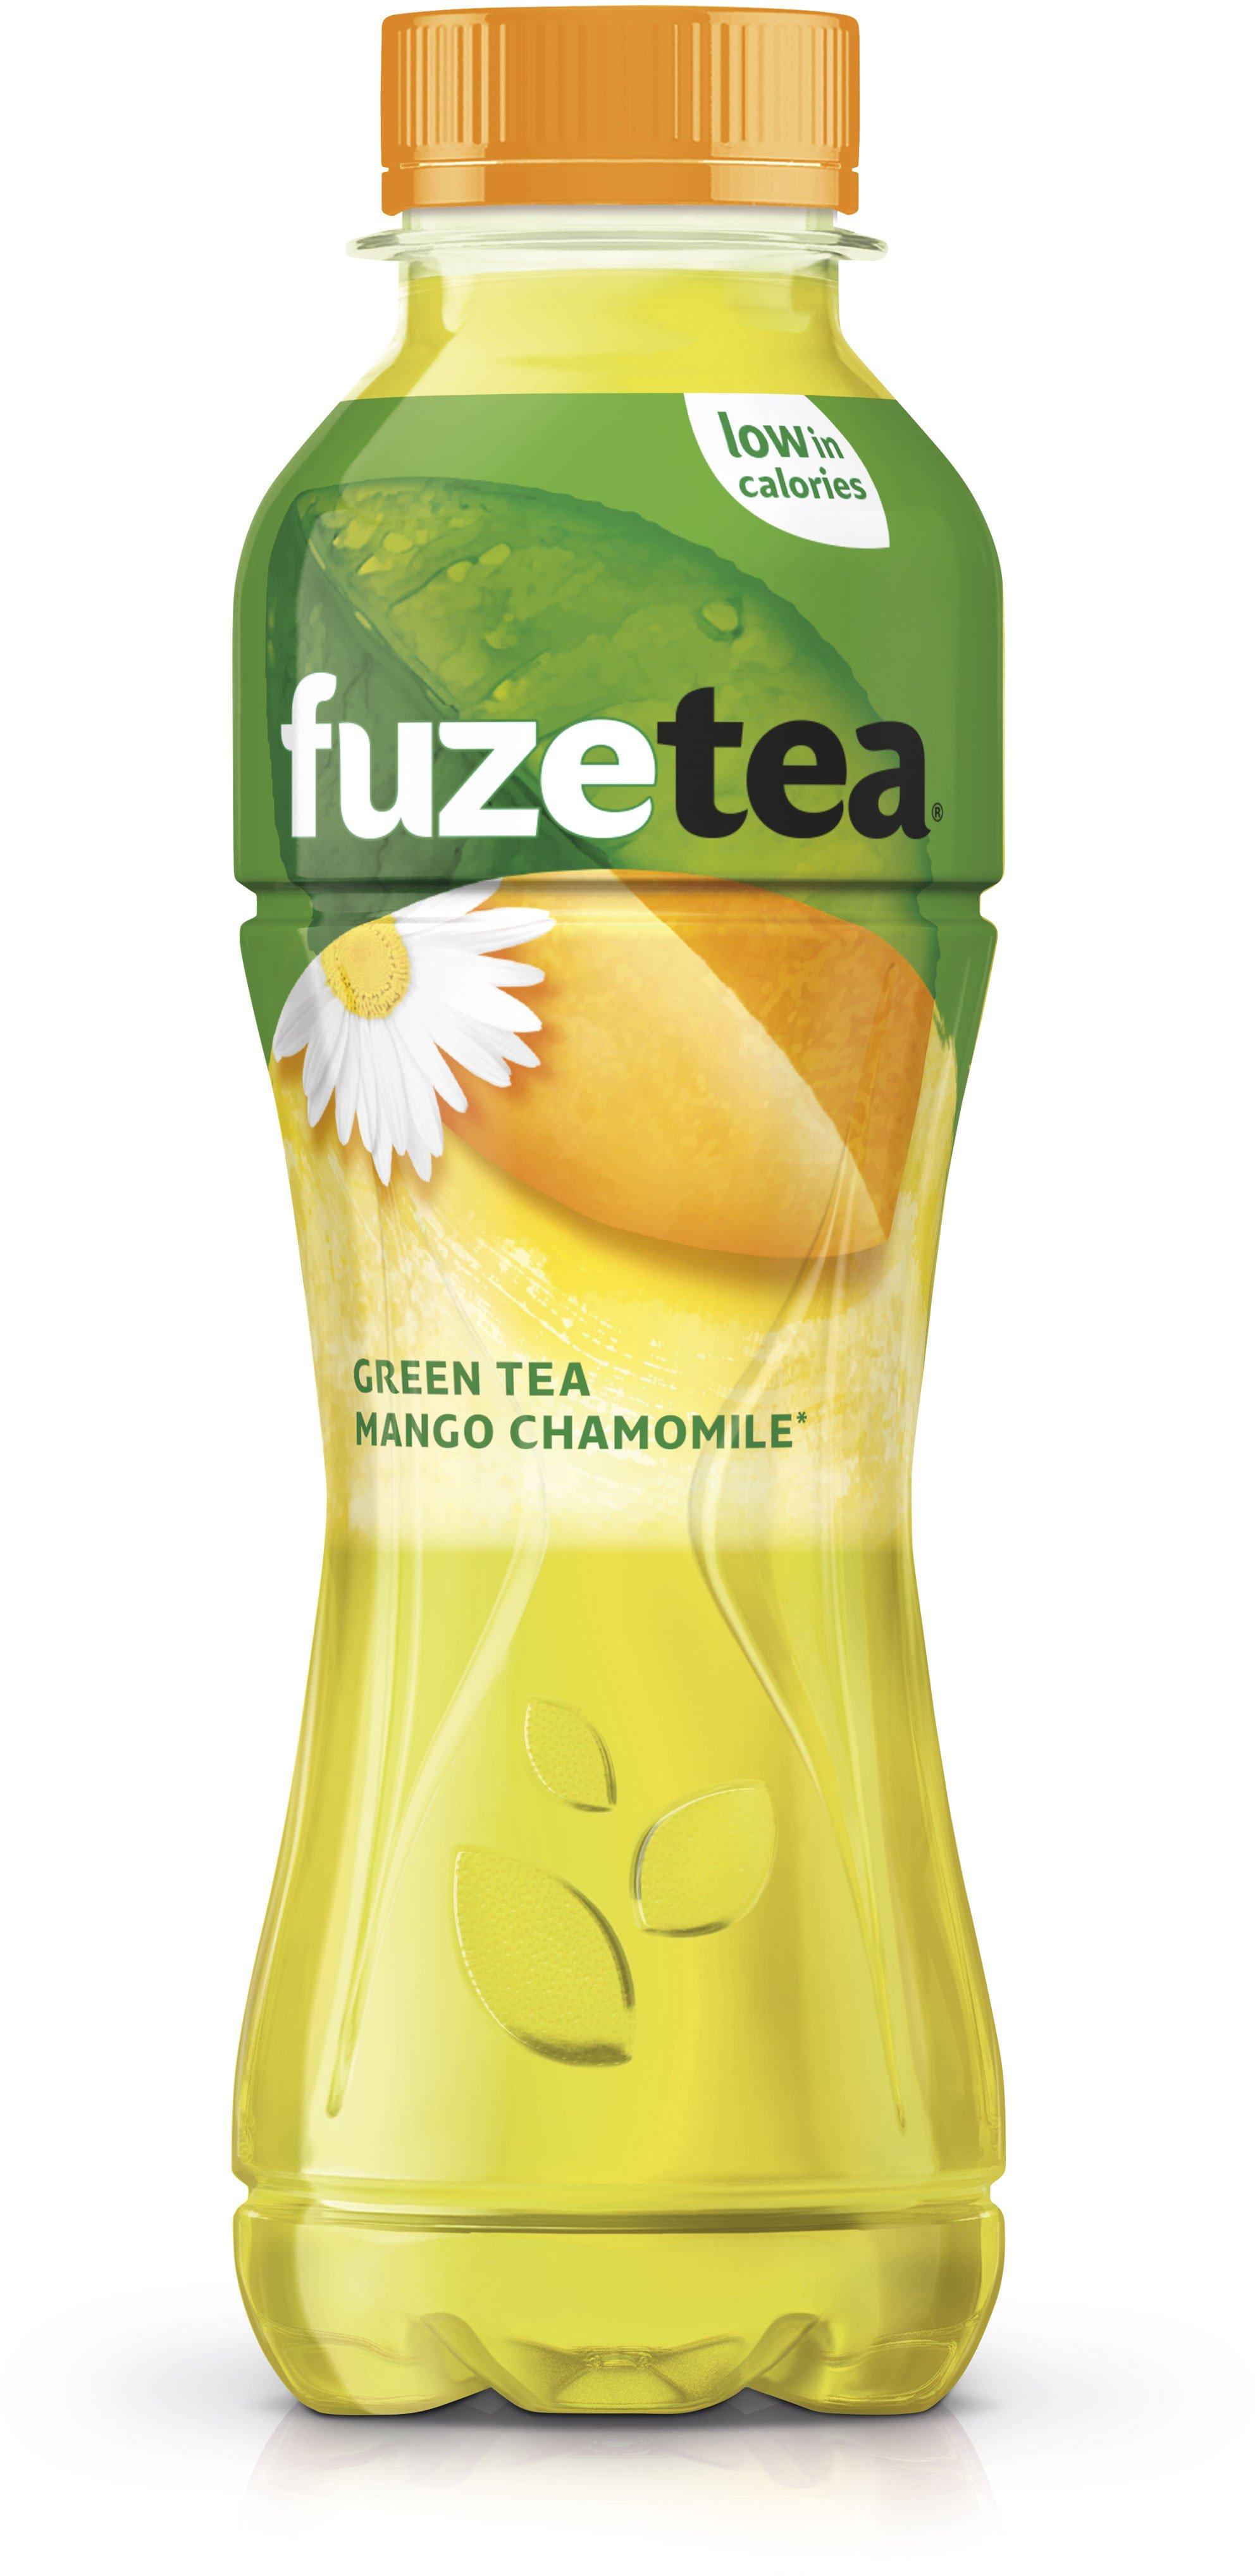 Fuze Tea Black Green Tea Mango Chamomile | 12 x 0,4 liter